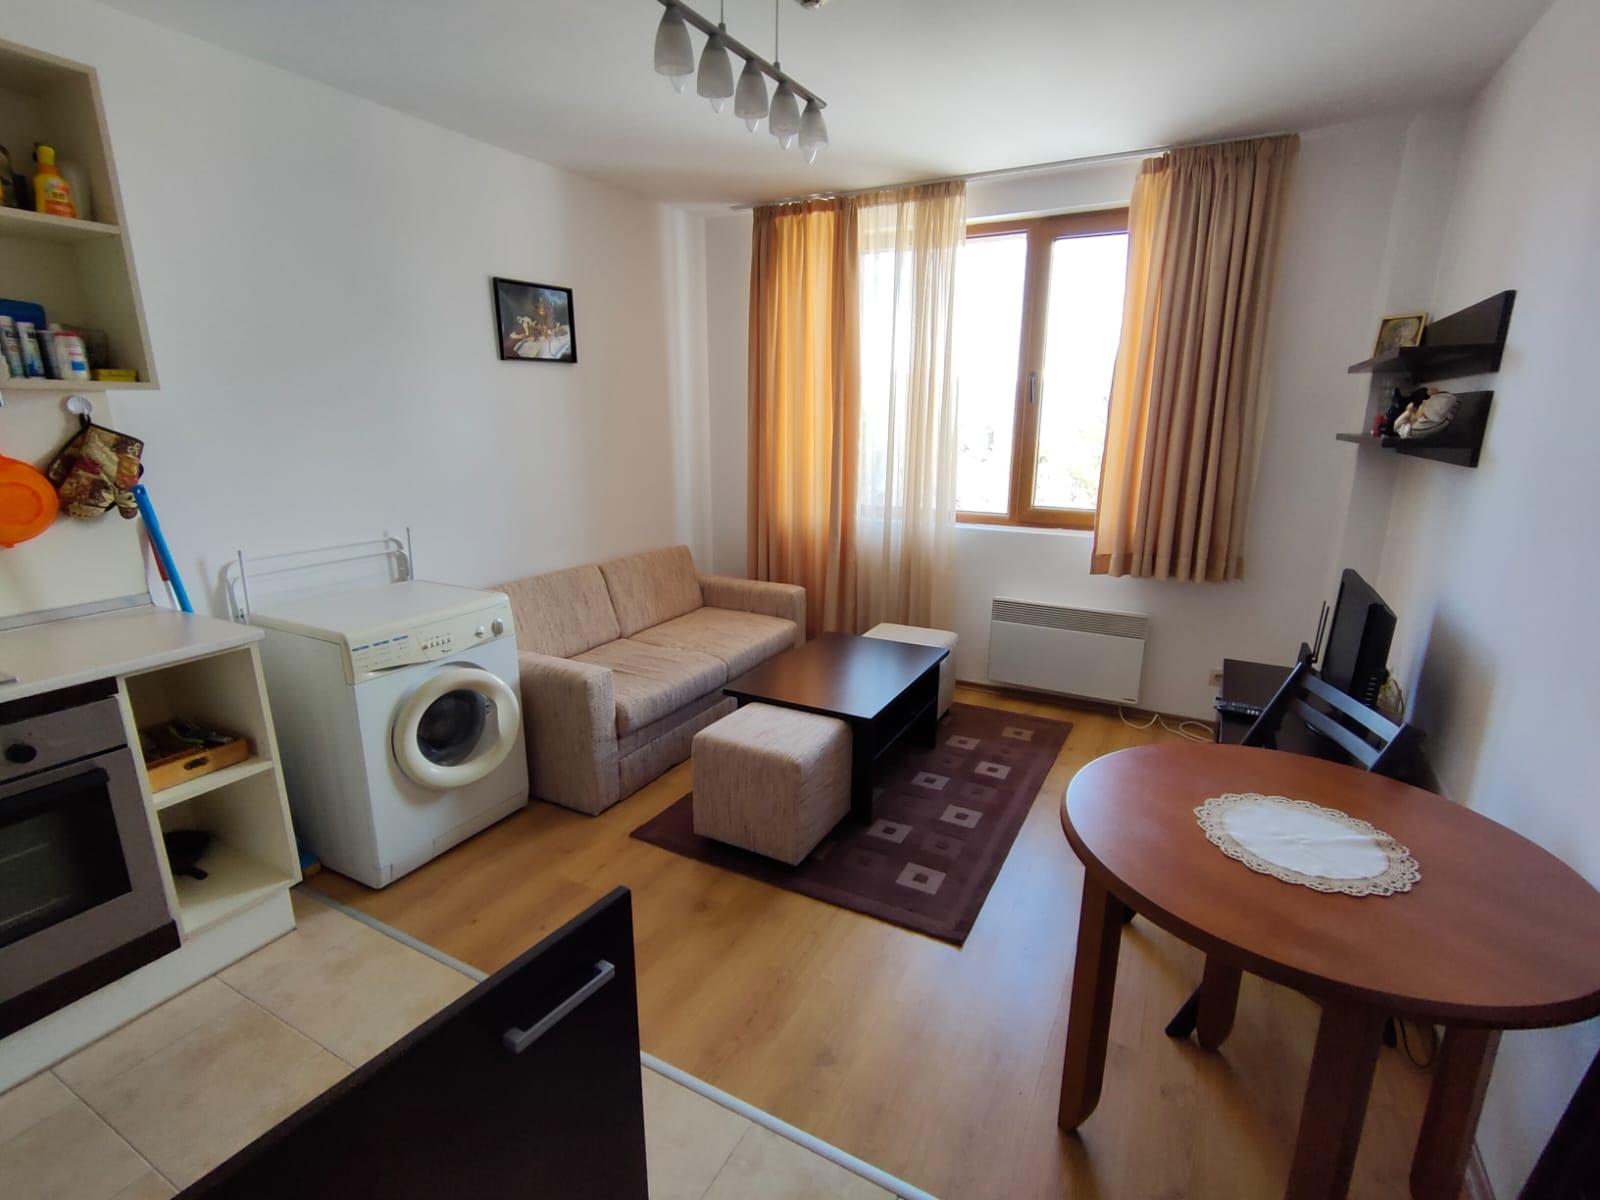 1-bedroom apartment in Kosara complex